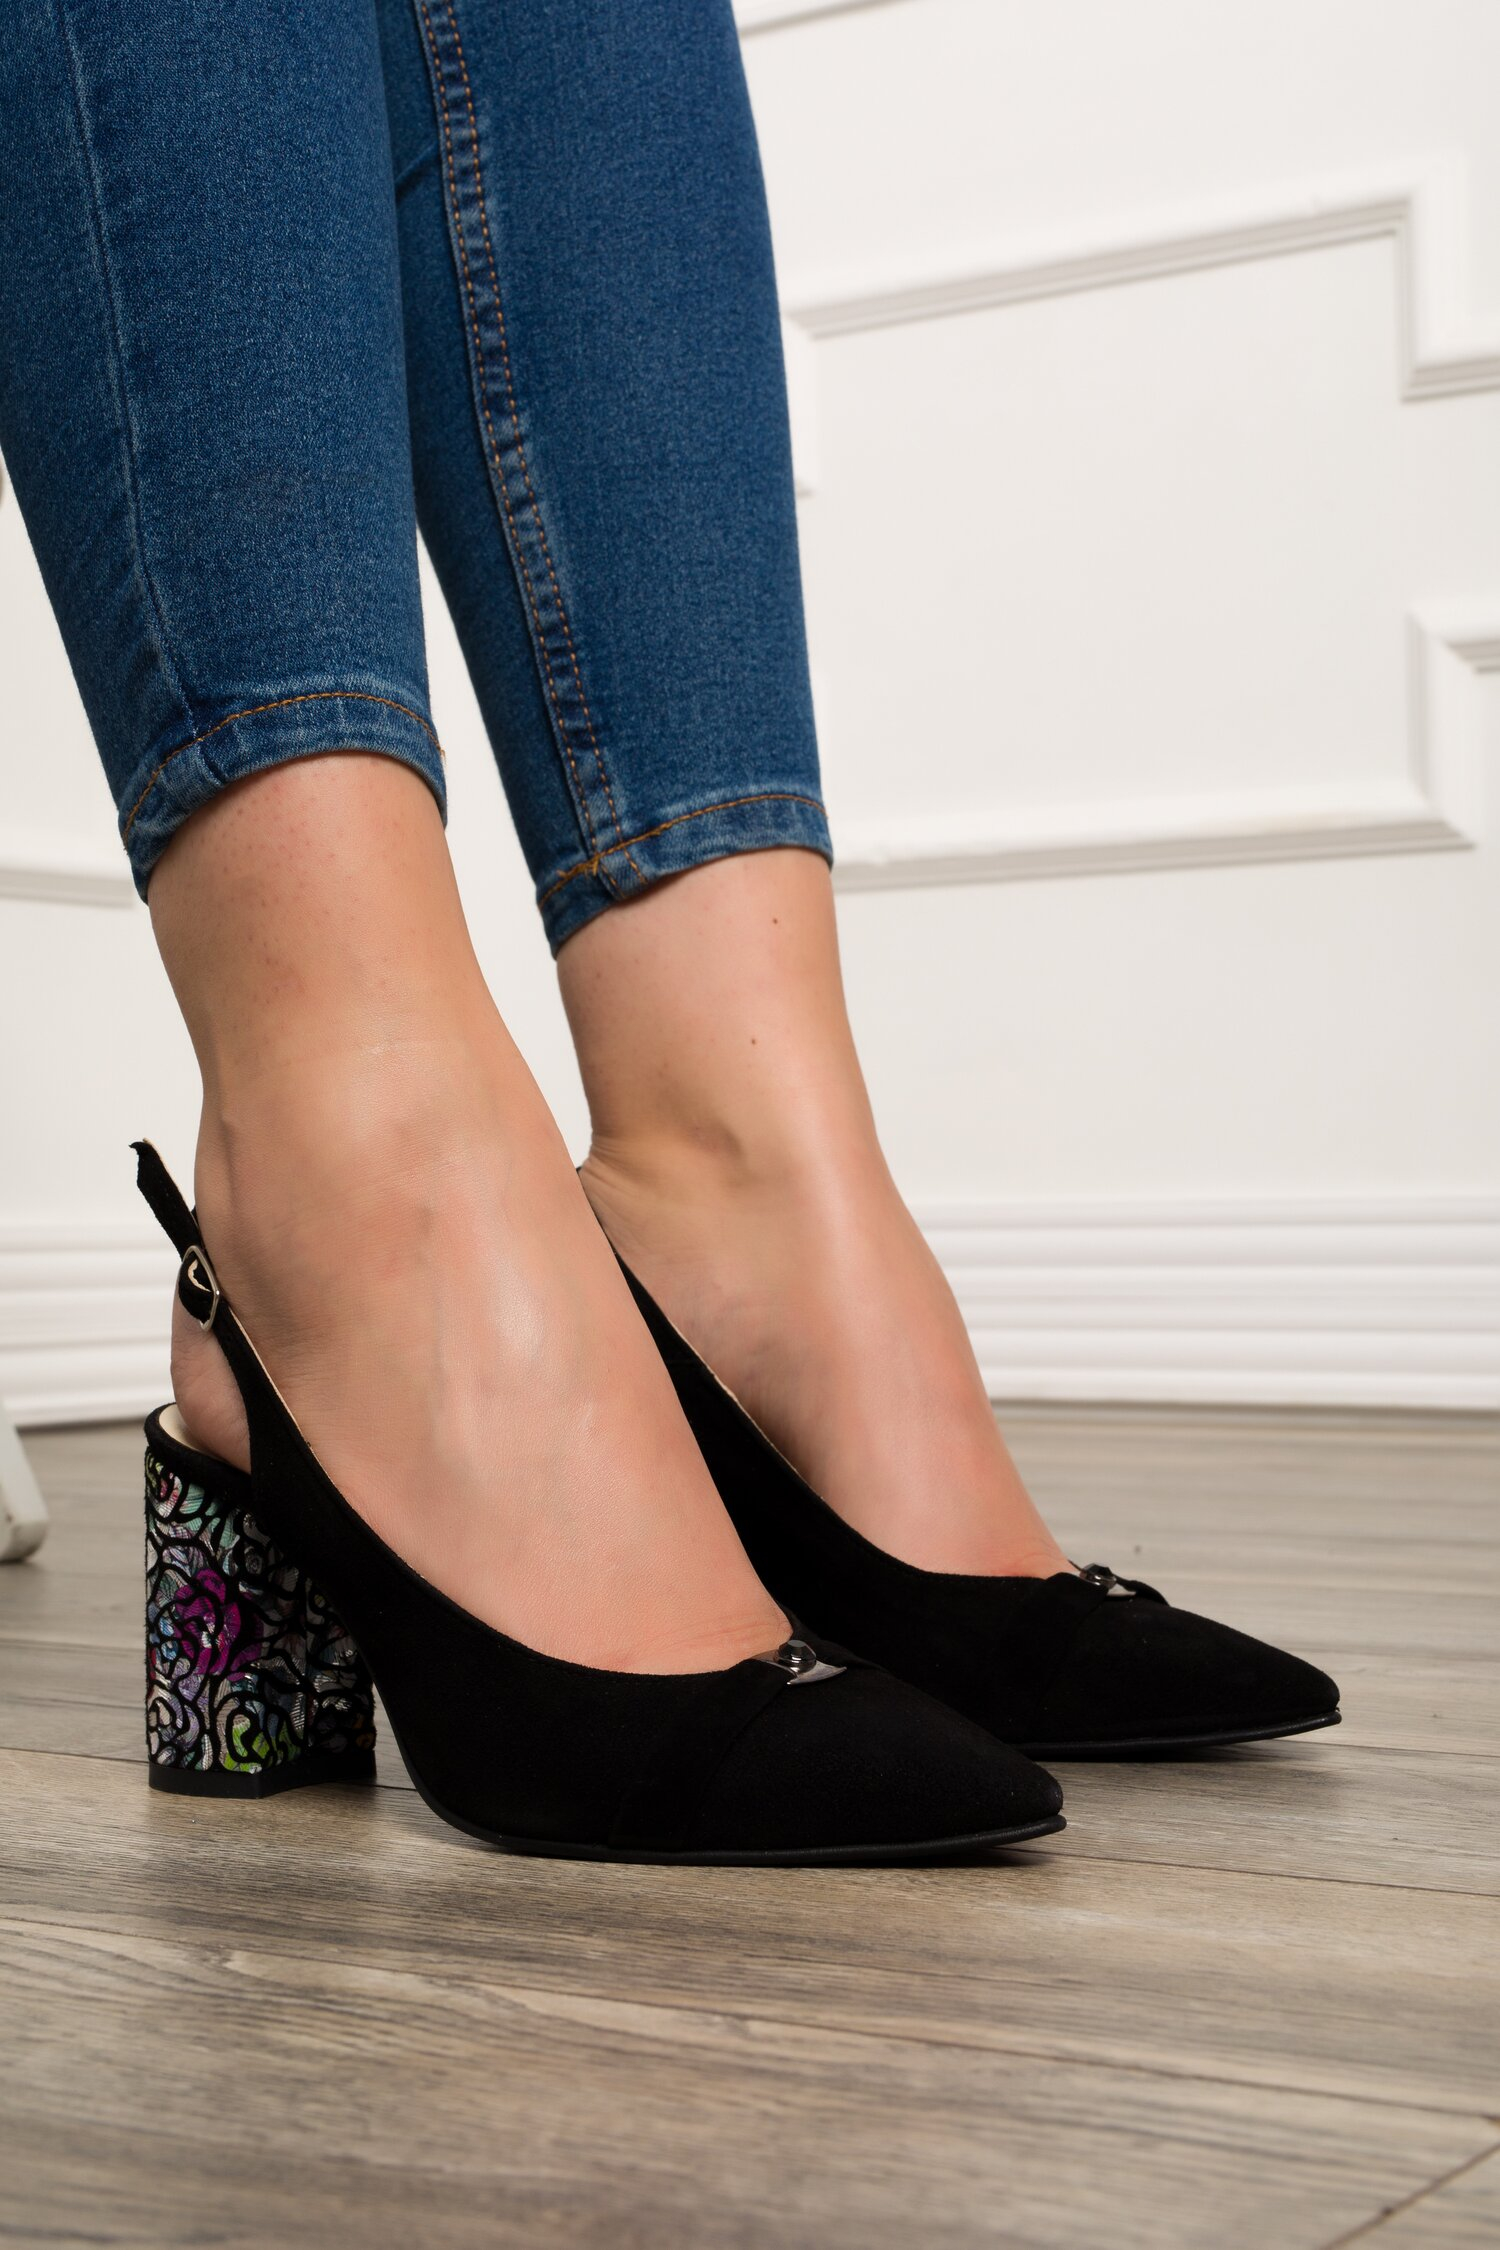 Pantofi negri cu decupaj la calcai si toc colorat